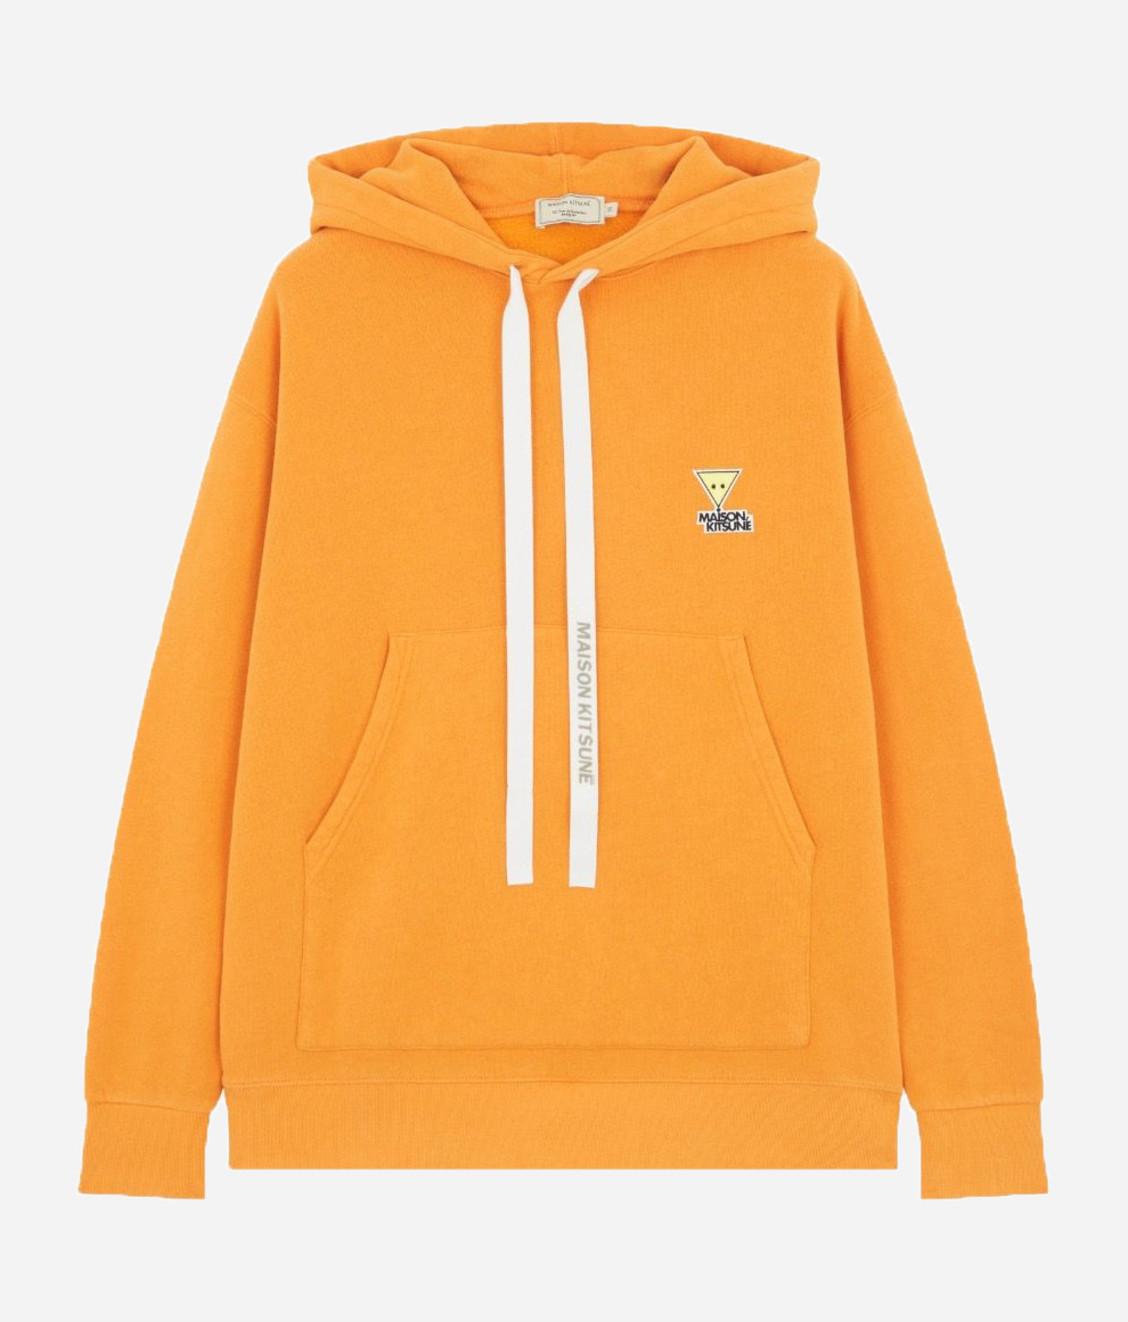 Maison Kitsune Kitsune Oversized Hoodie Orange